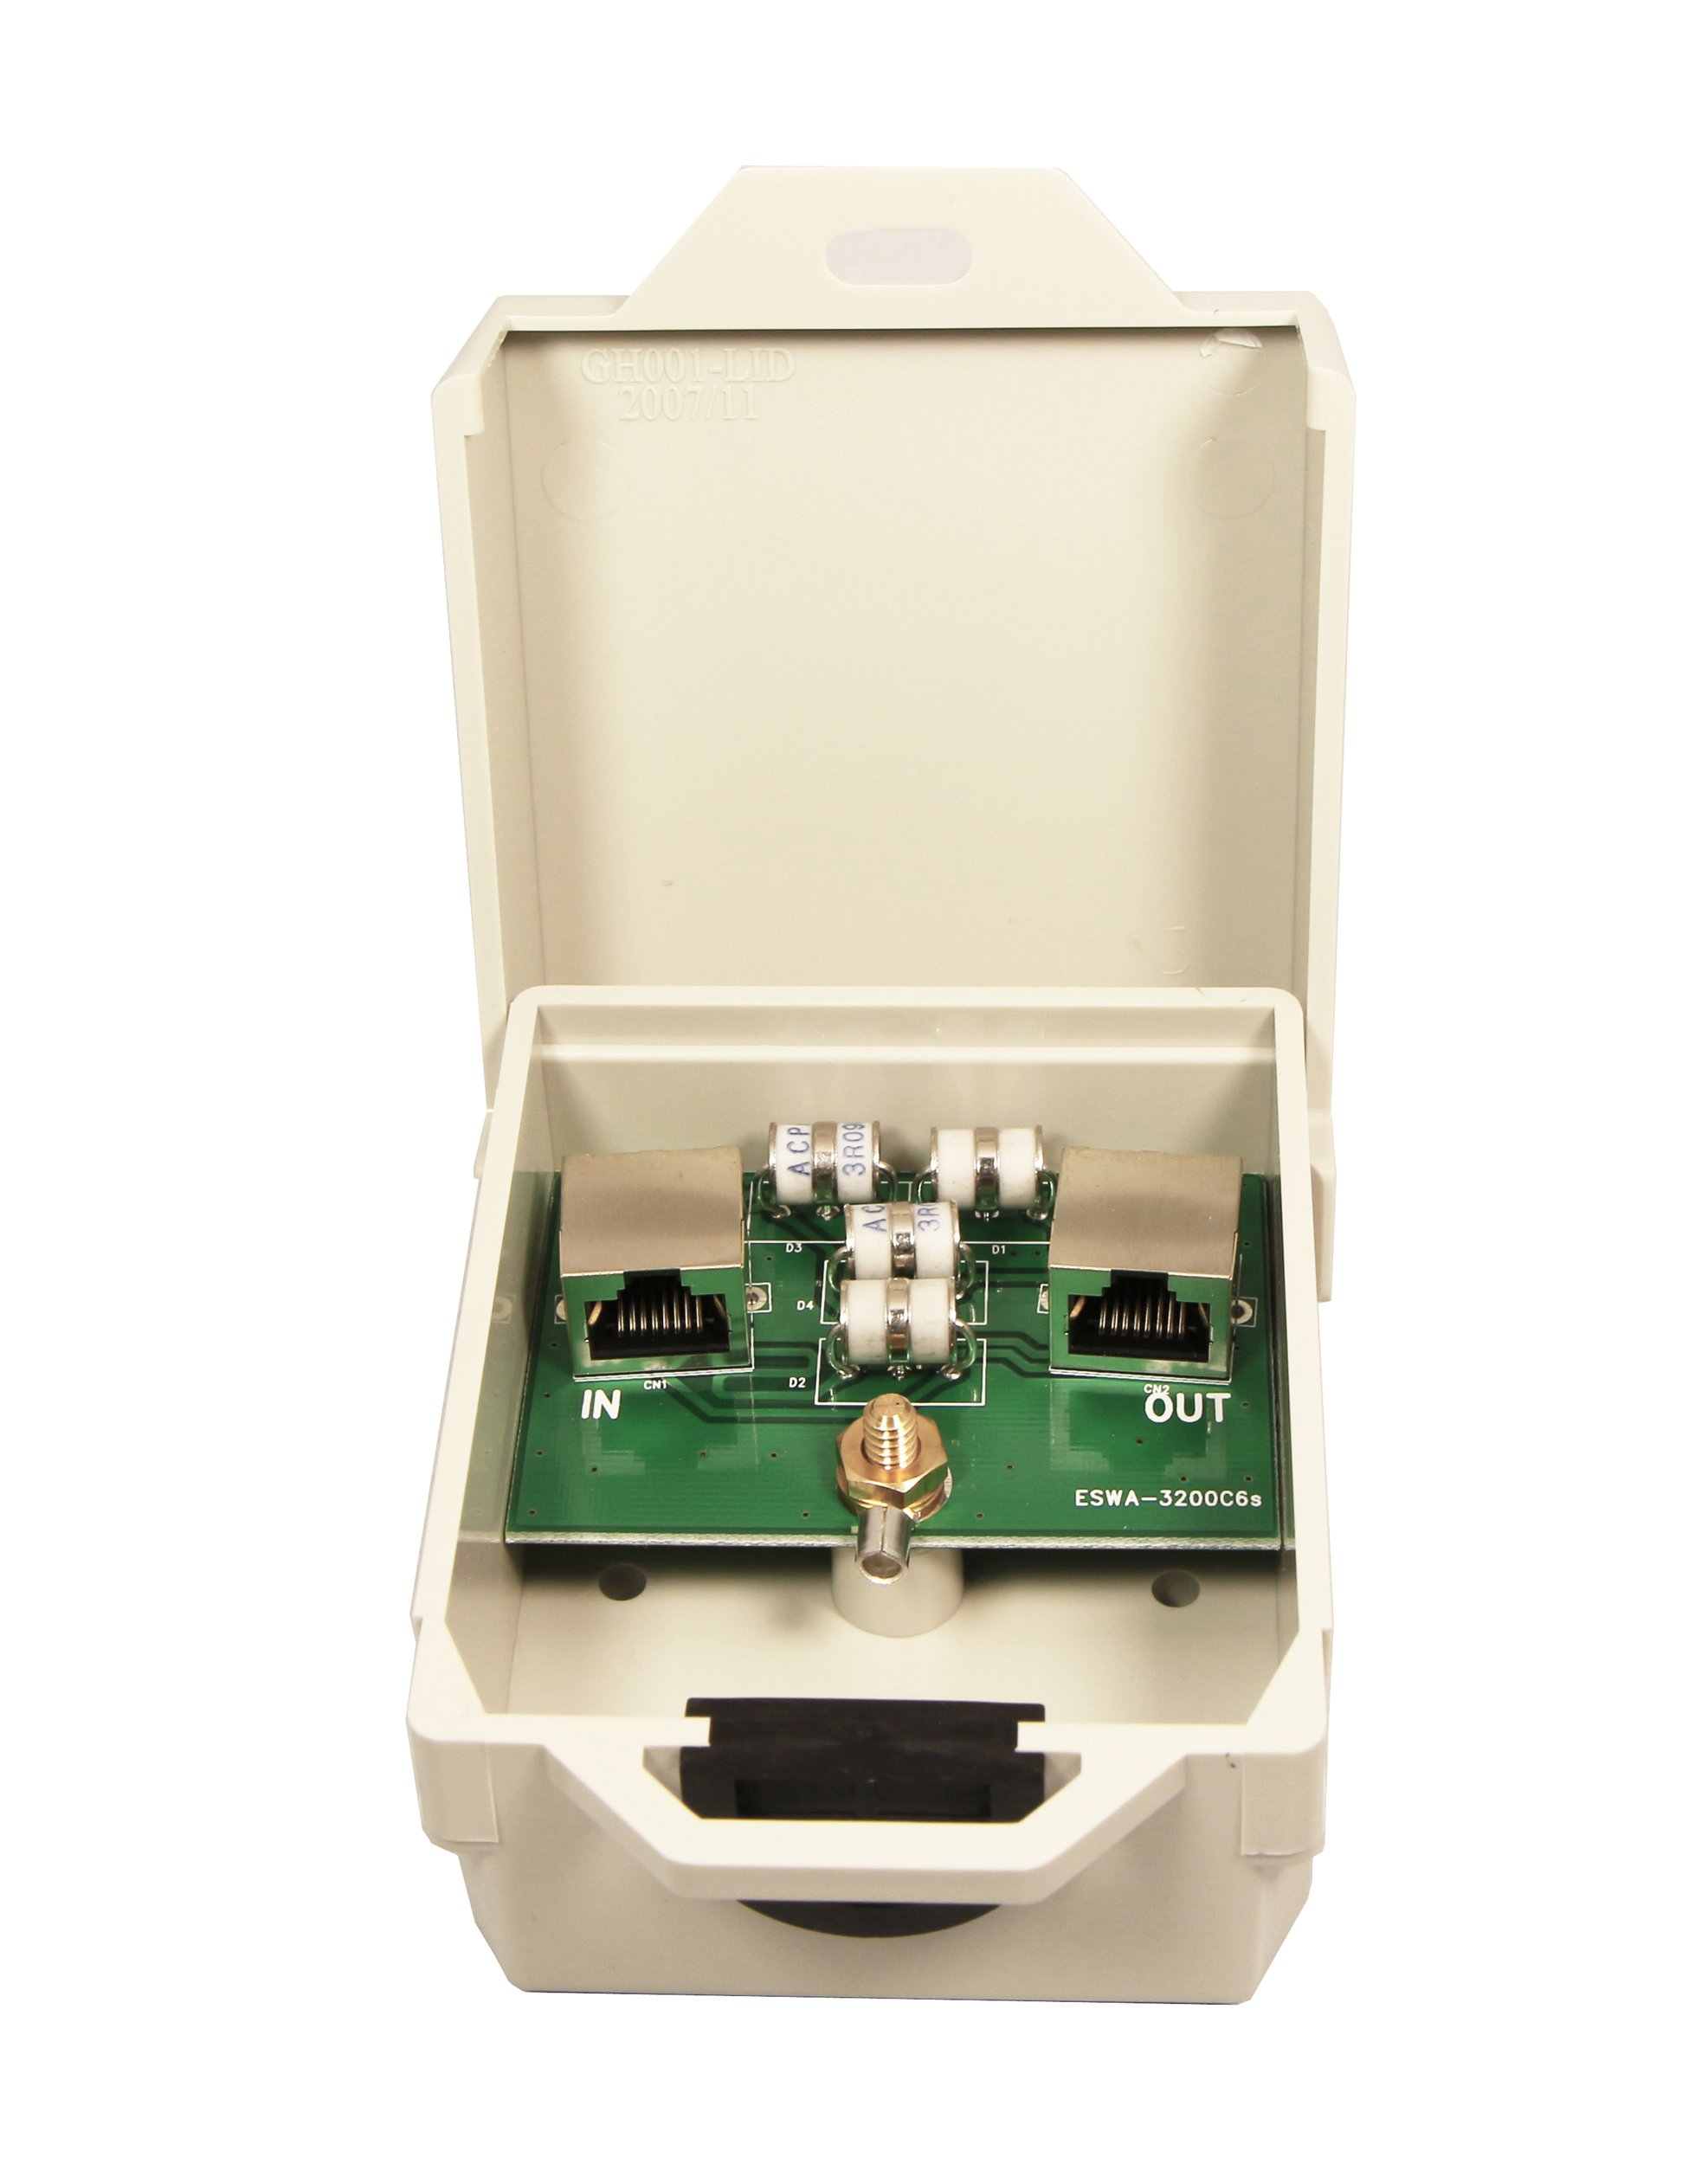 Tupavco TP303 Ethernet Surge Protector Outdoor for PoE+ Gigabit 1000Mbs - LAN Network Thunder Lightning Surge Protection Suppressor/Arrester